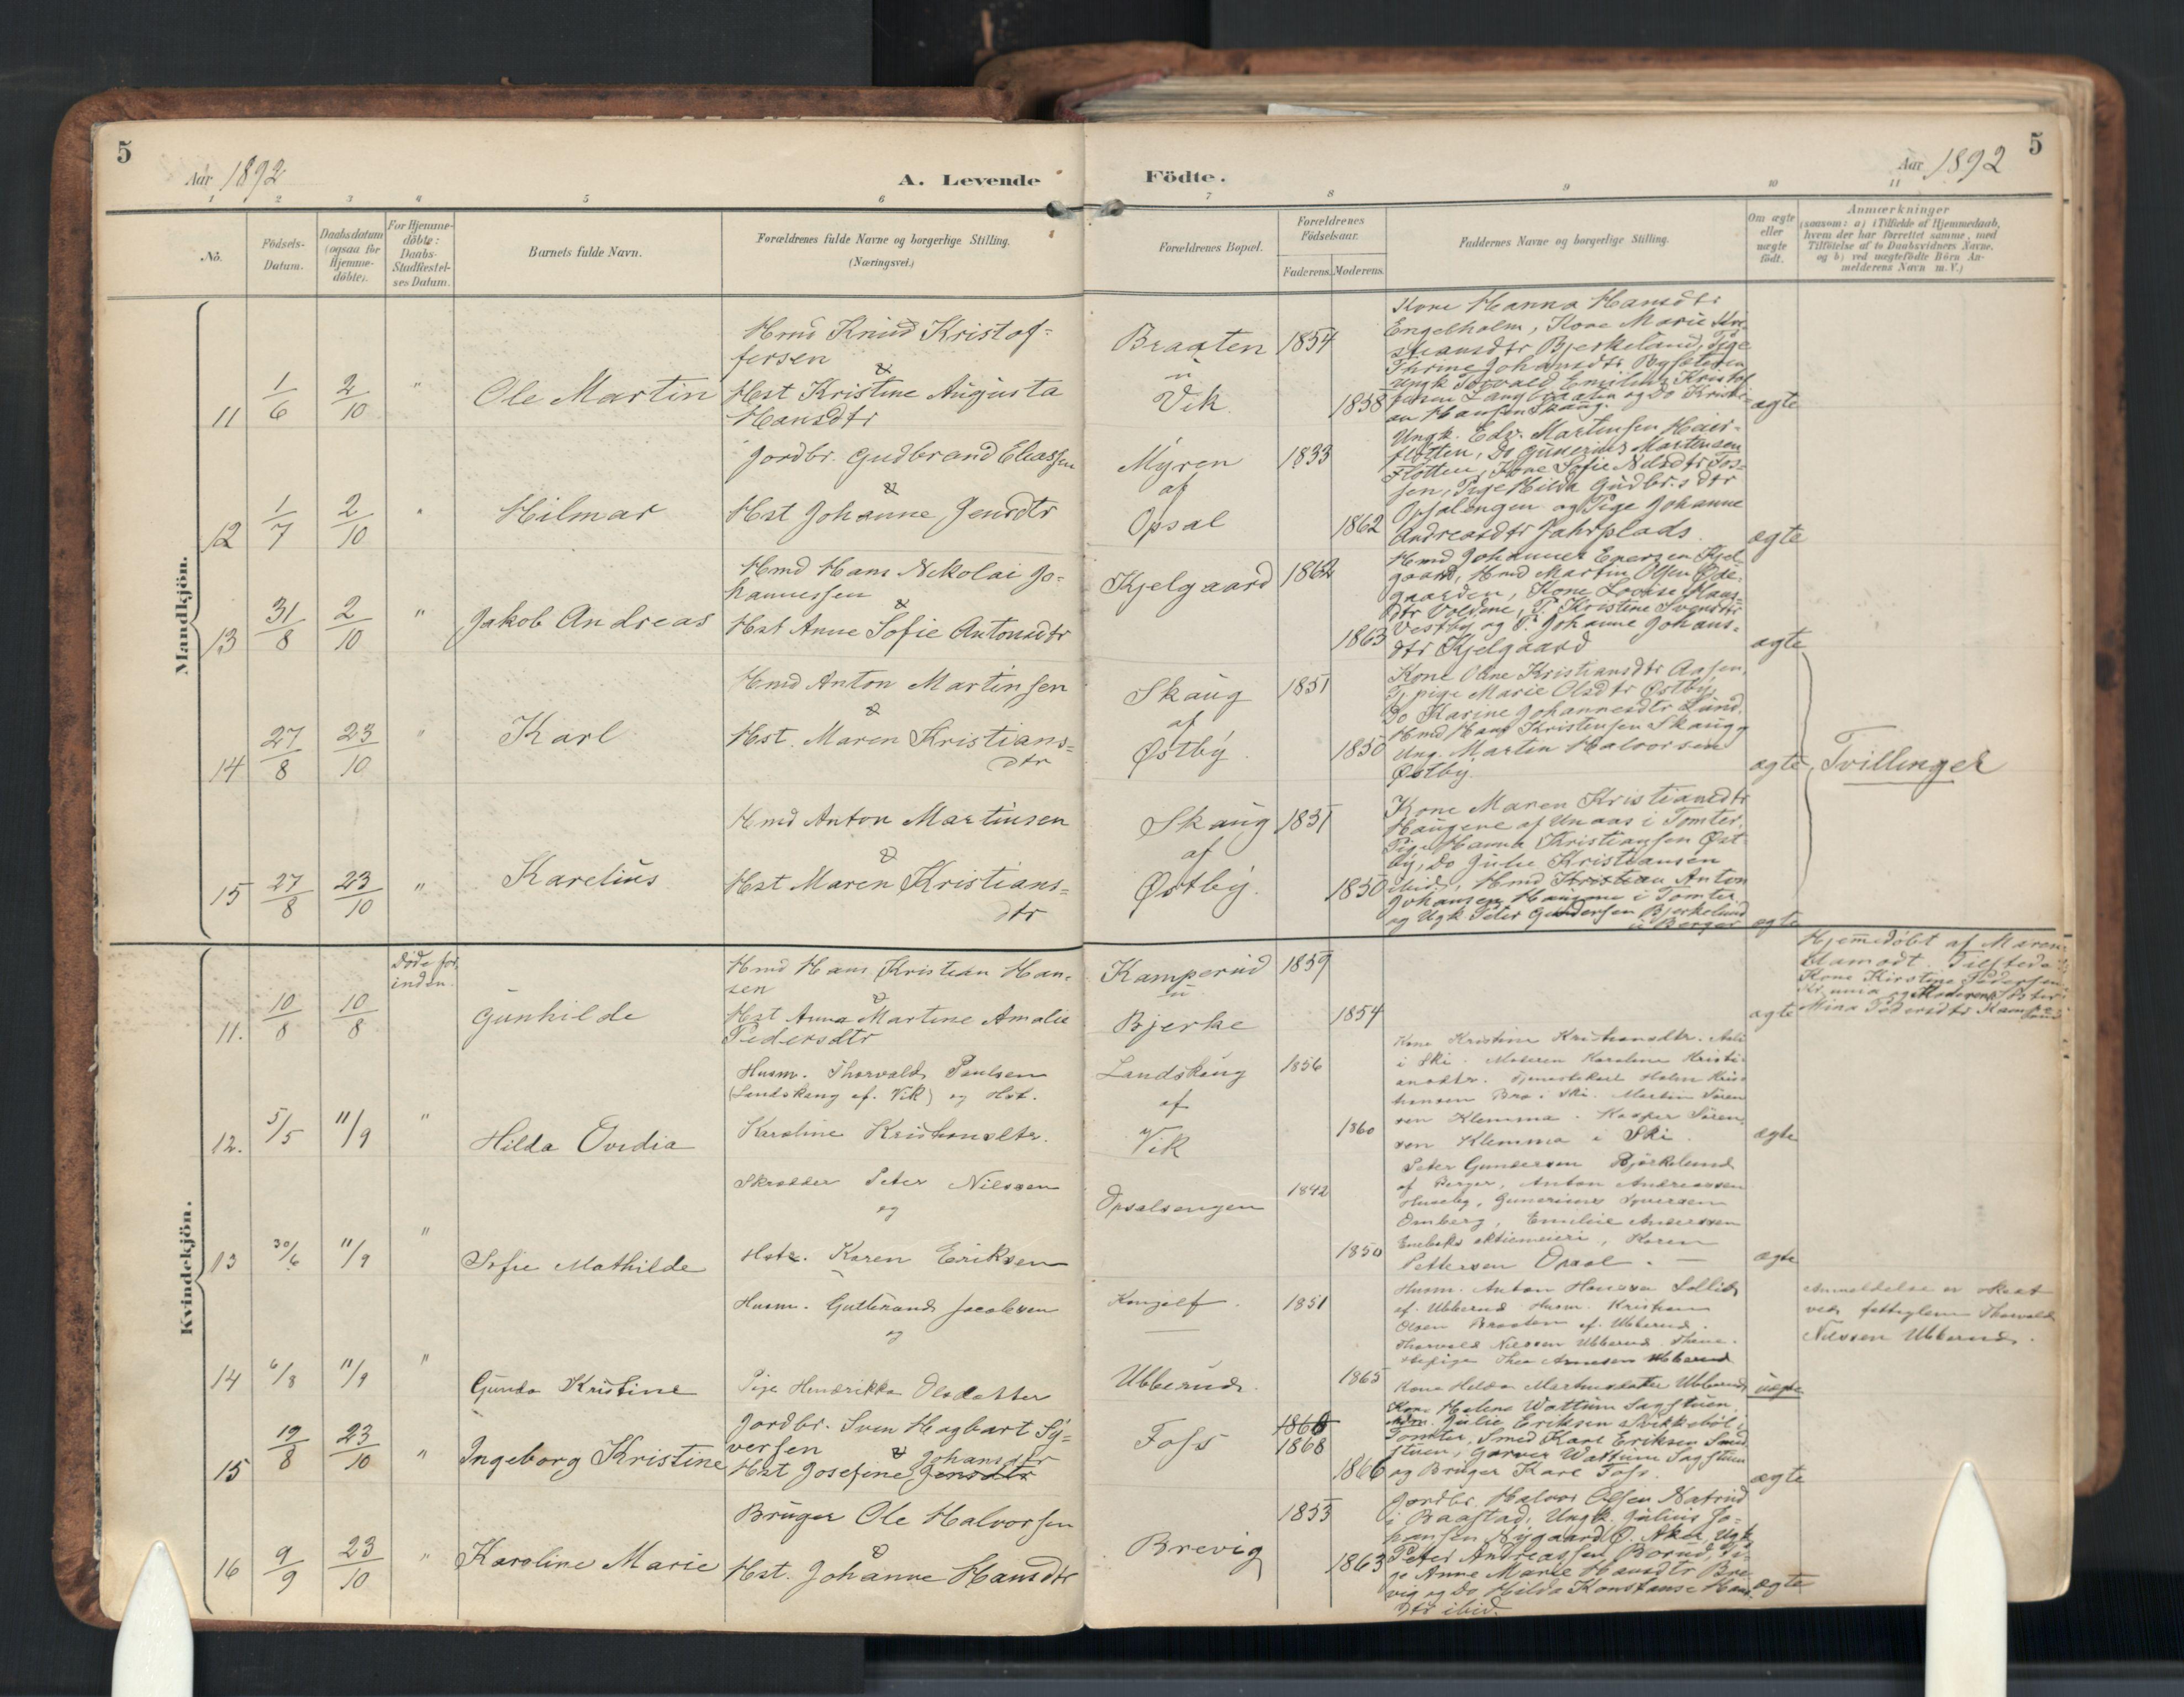 SAO, Enebakk prestekontor Kirkebøker, F/Fb/L0002: Parish register (official) no. II 2, 1891-1959, p. 5